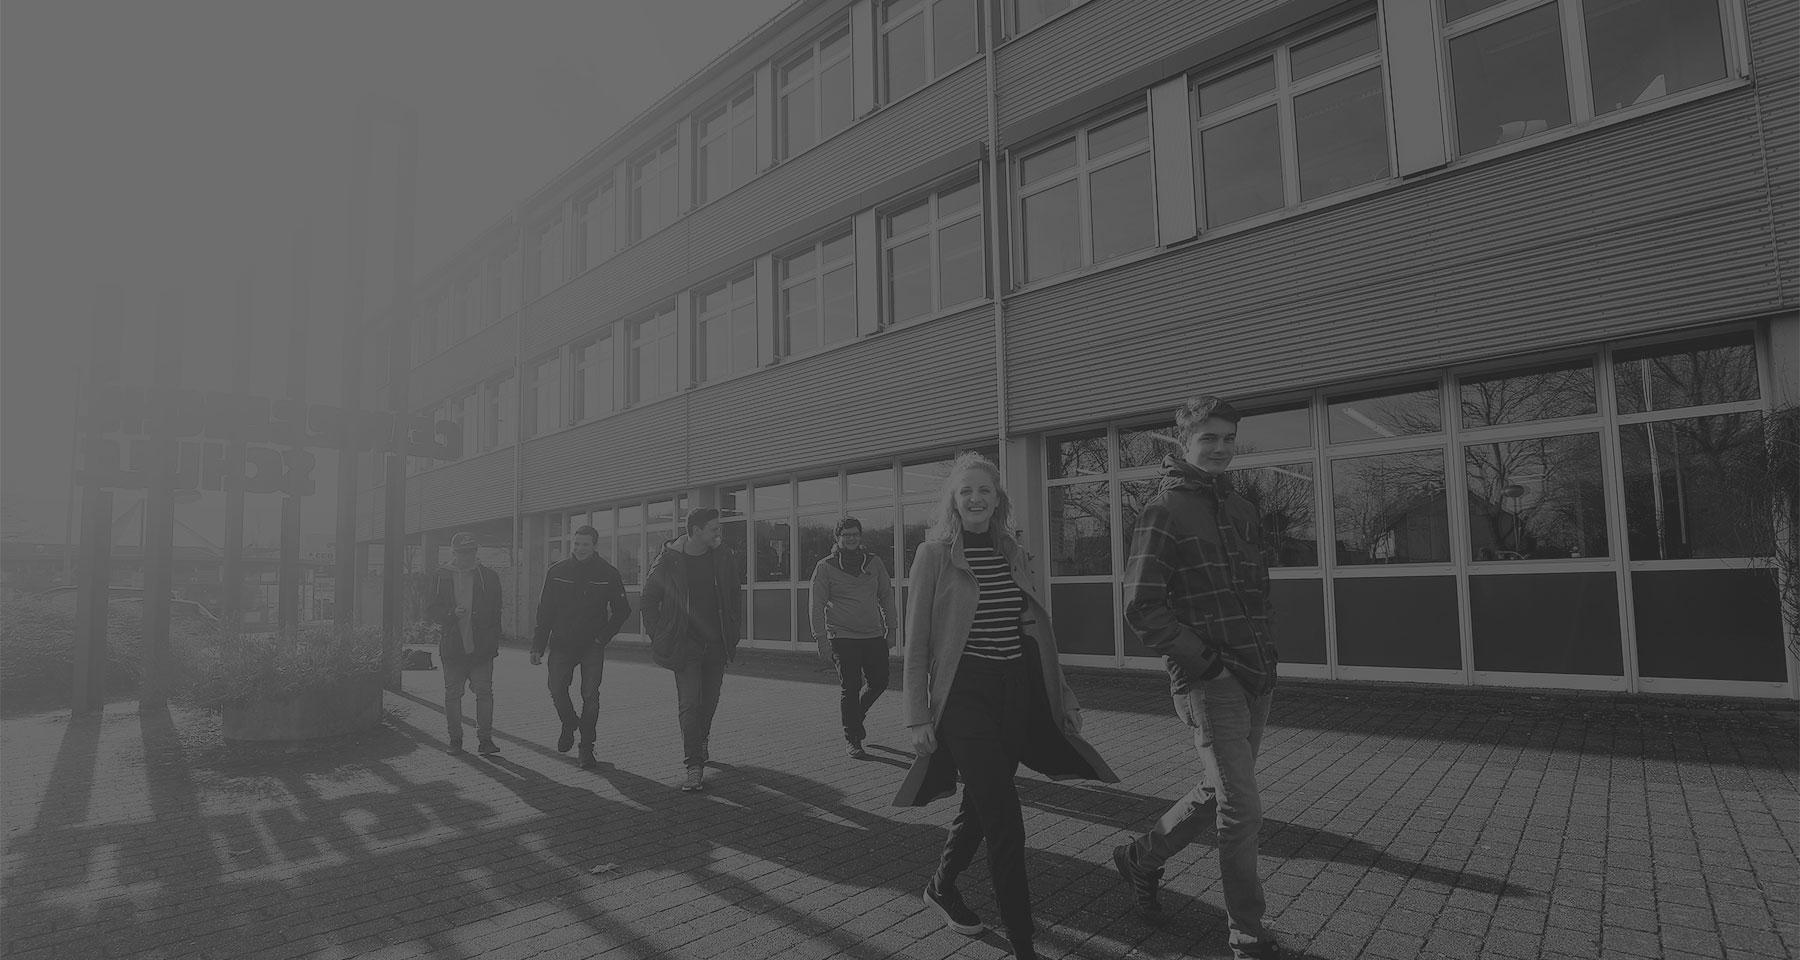 Gewerbliche Schule Metzingen